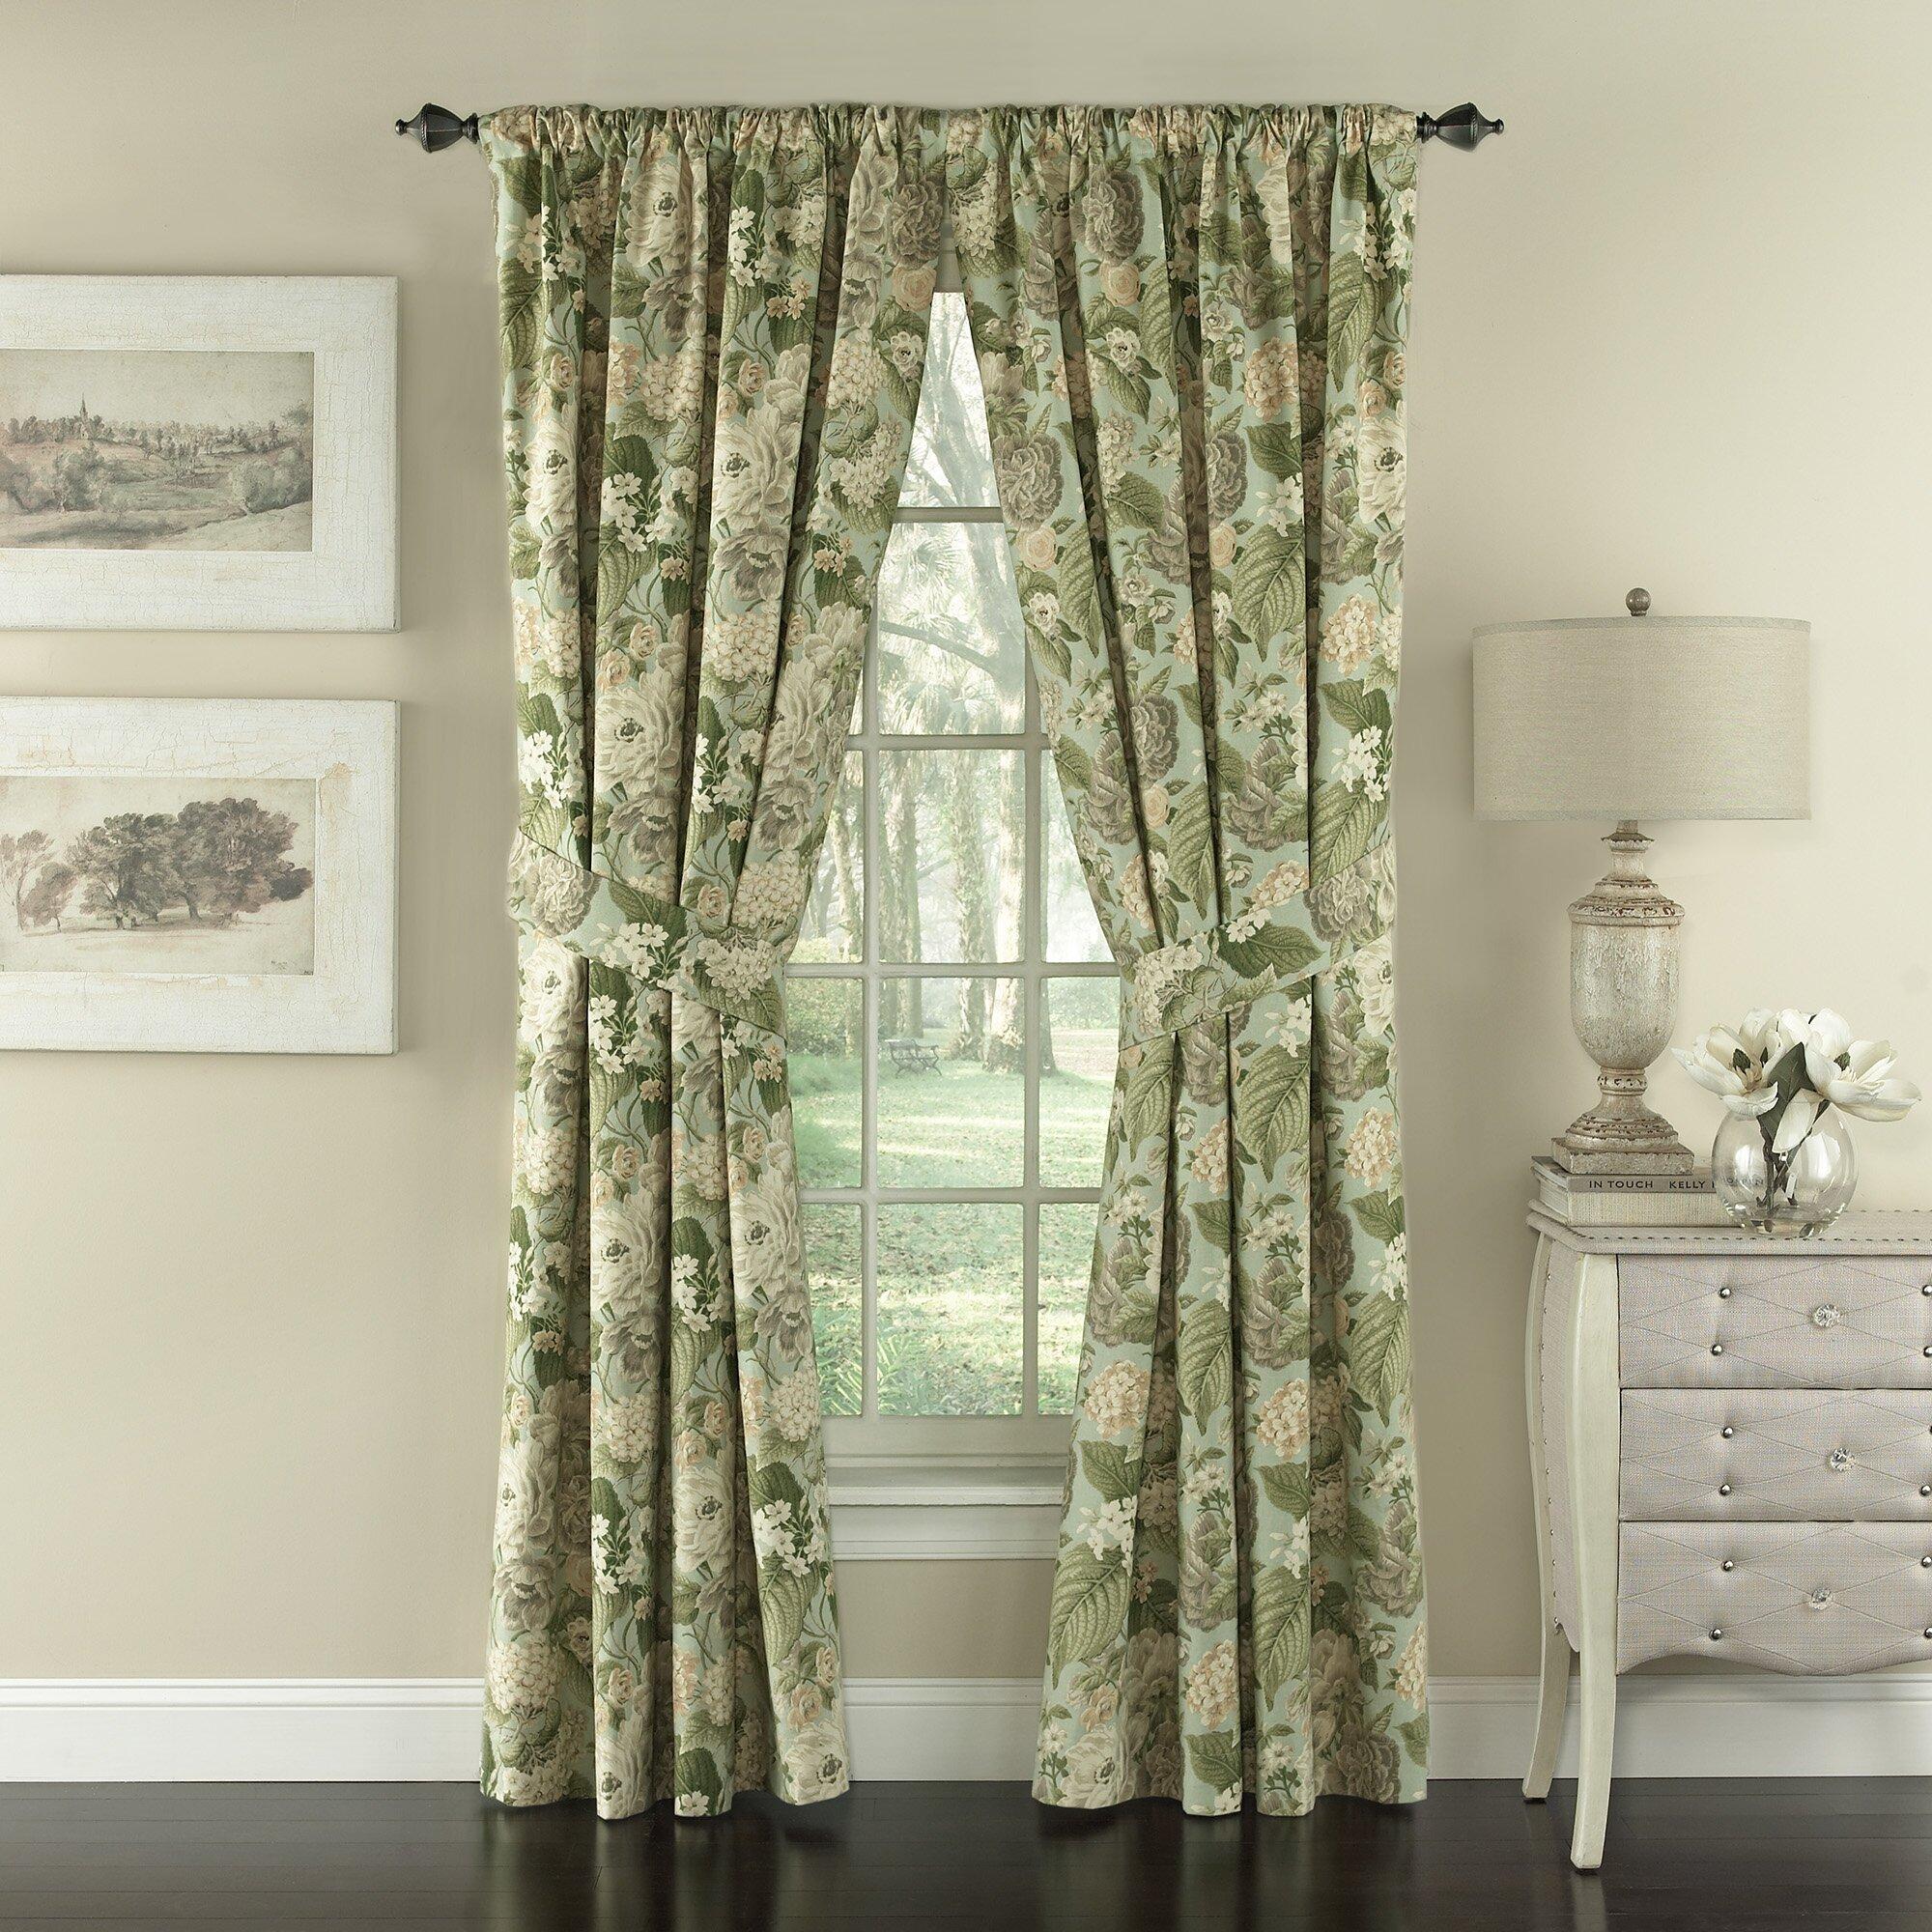 Kitchen Curtains In Kenya: Waverly Garden Glory Nature/Floral Semi-Sheer Rod Pocket